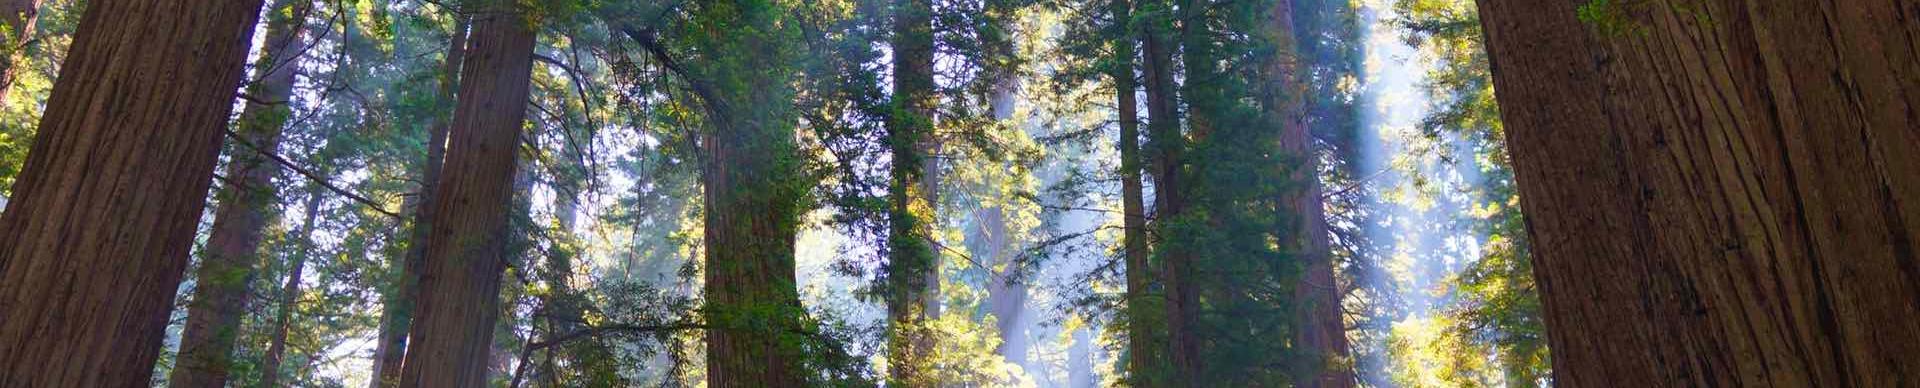 treeslice2